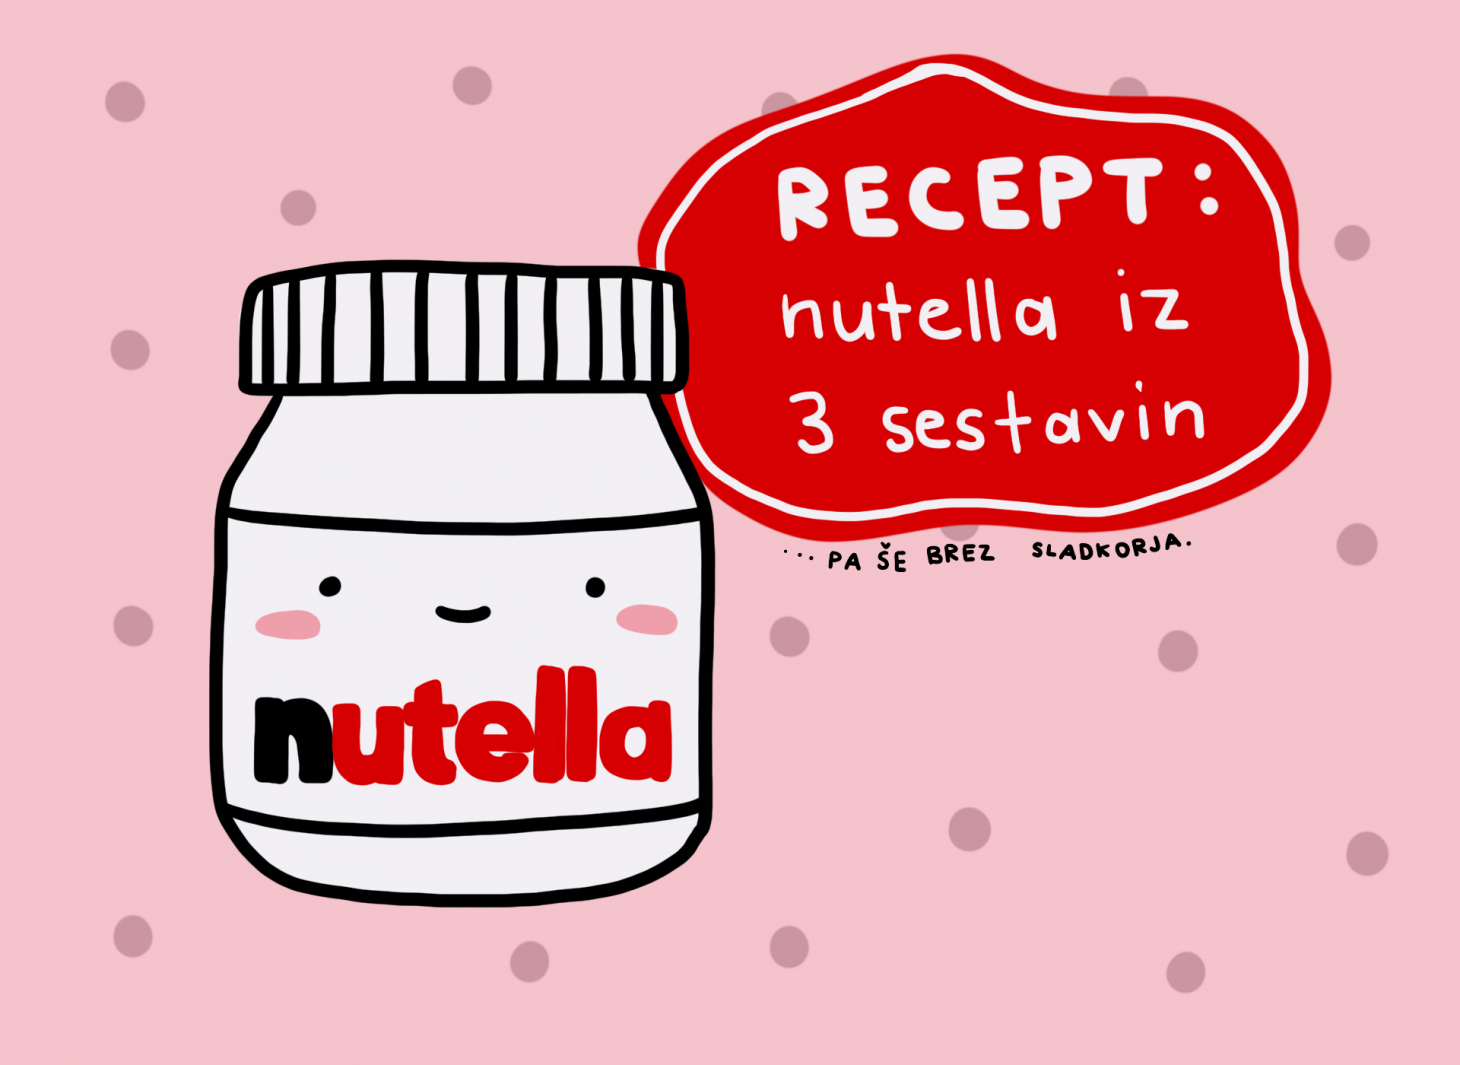 Recept: Nutella iz 3 sestavin